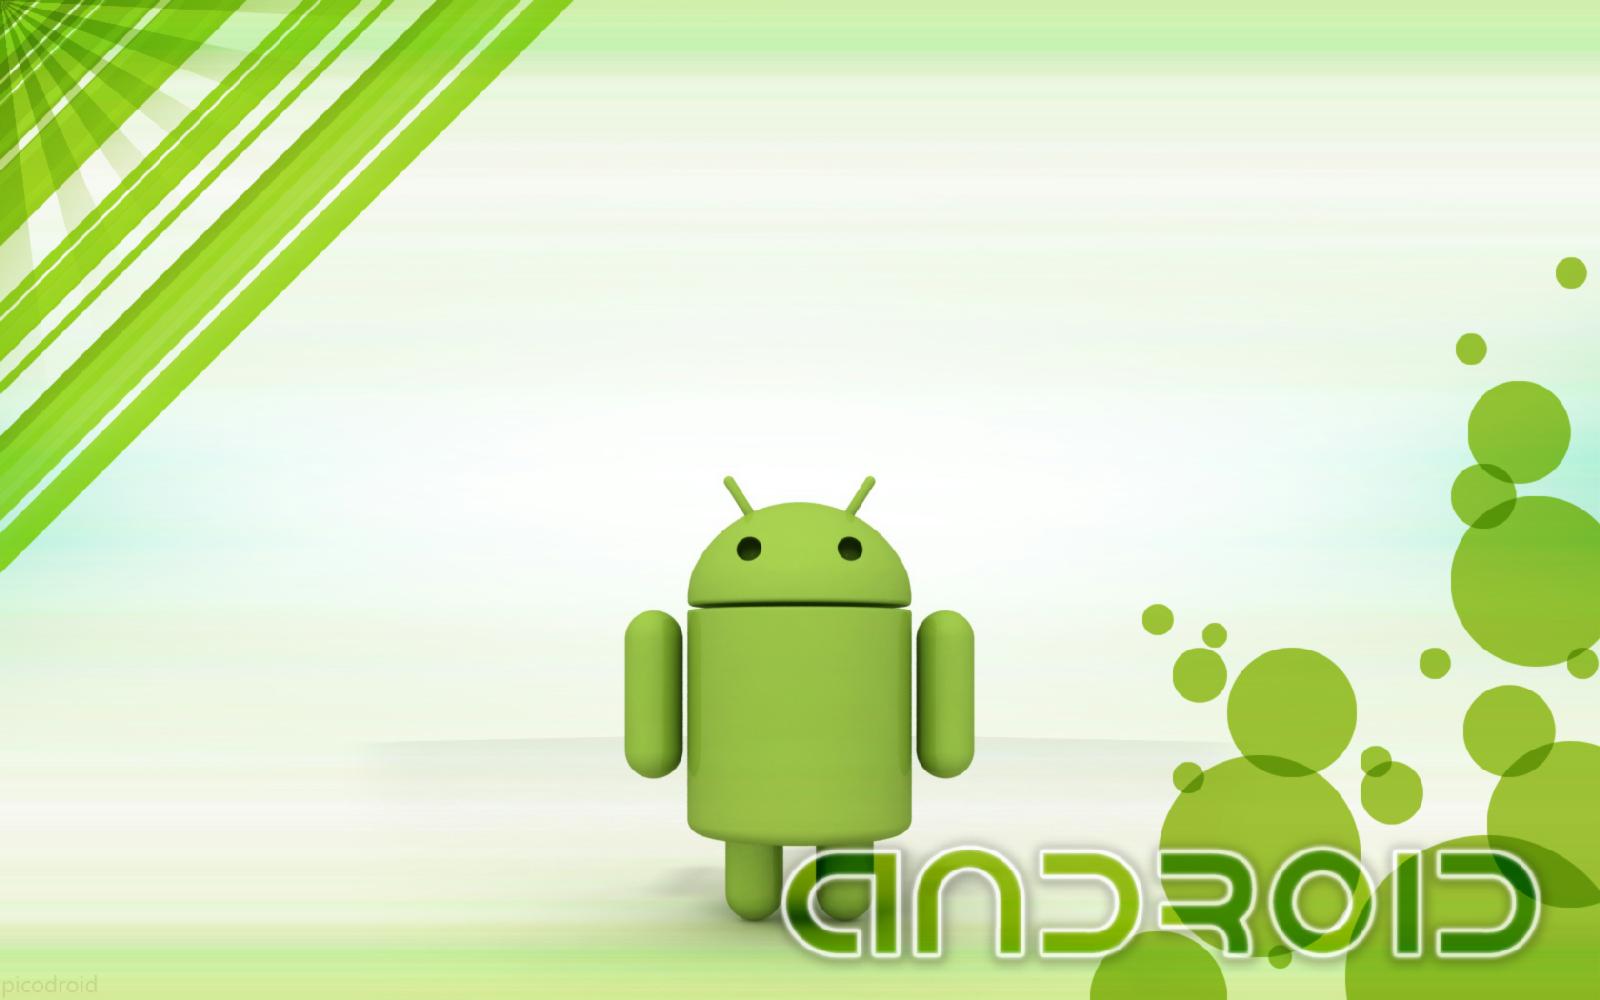 https://1.bp.blogspot.com/-jm0LXIv4tJY/UD0-pjkor1I/AAAAAAAAKas/Ry4vk99JB9A/s1600/Android_nice_vector.jpg